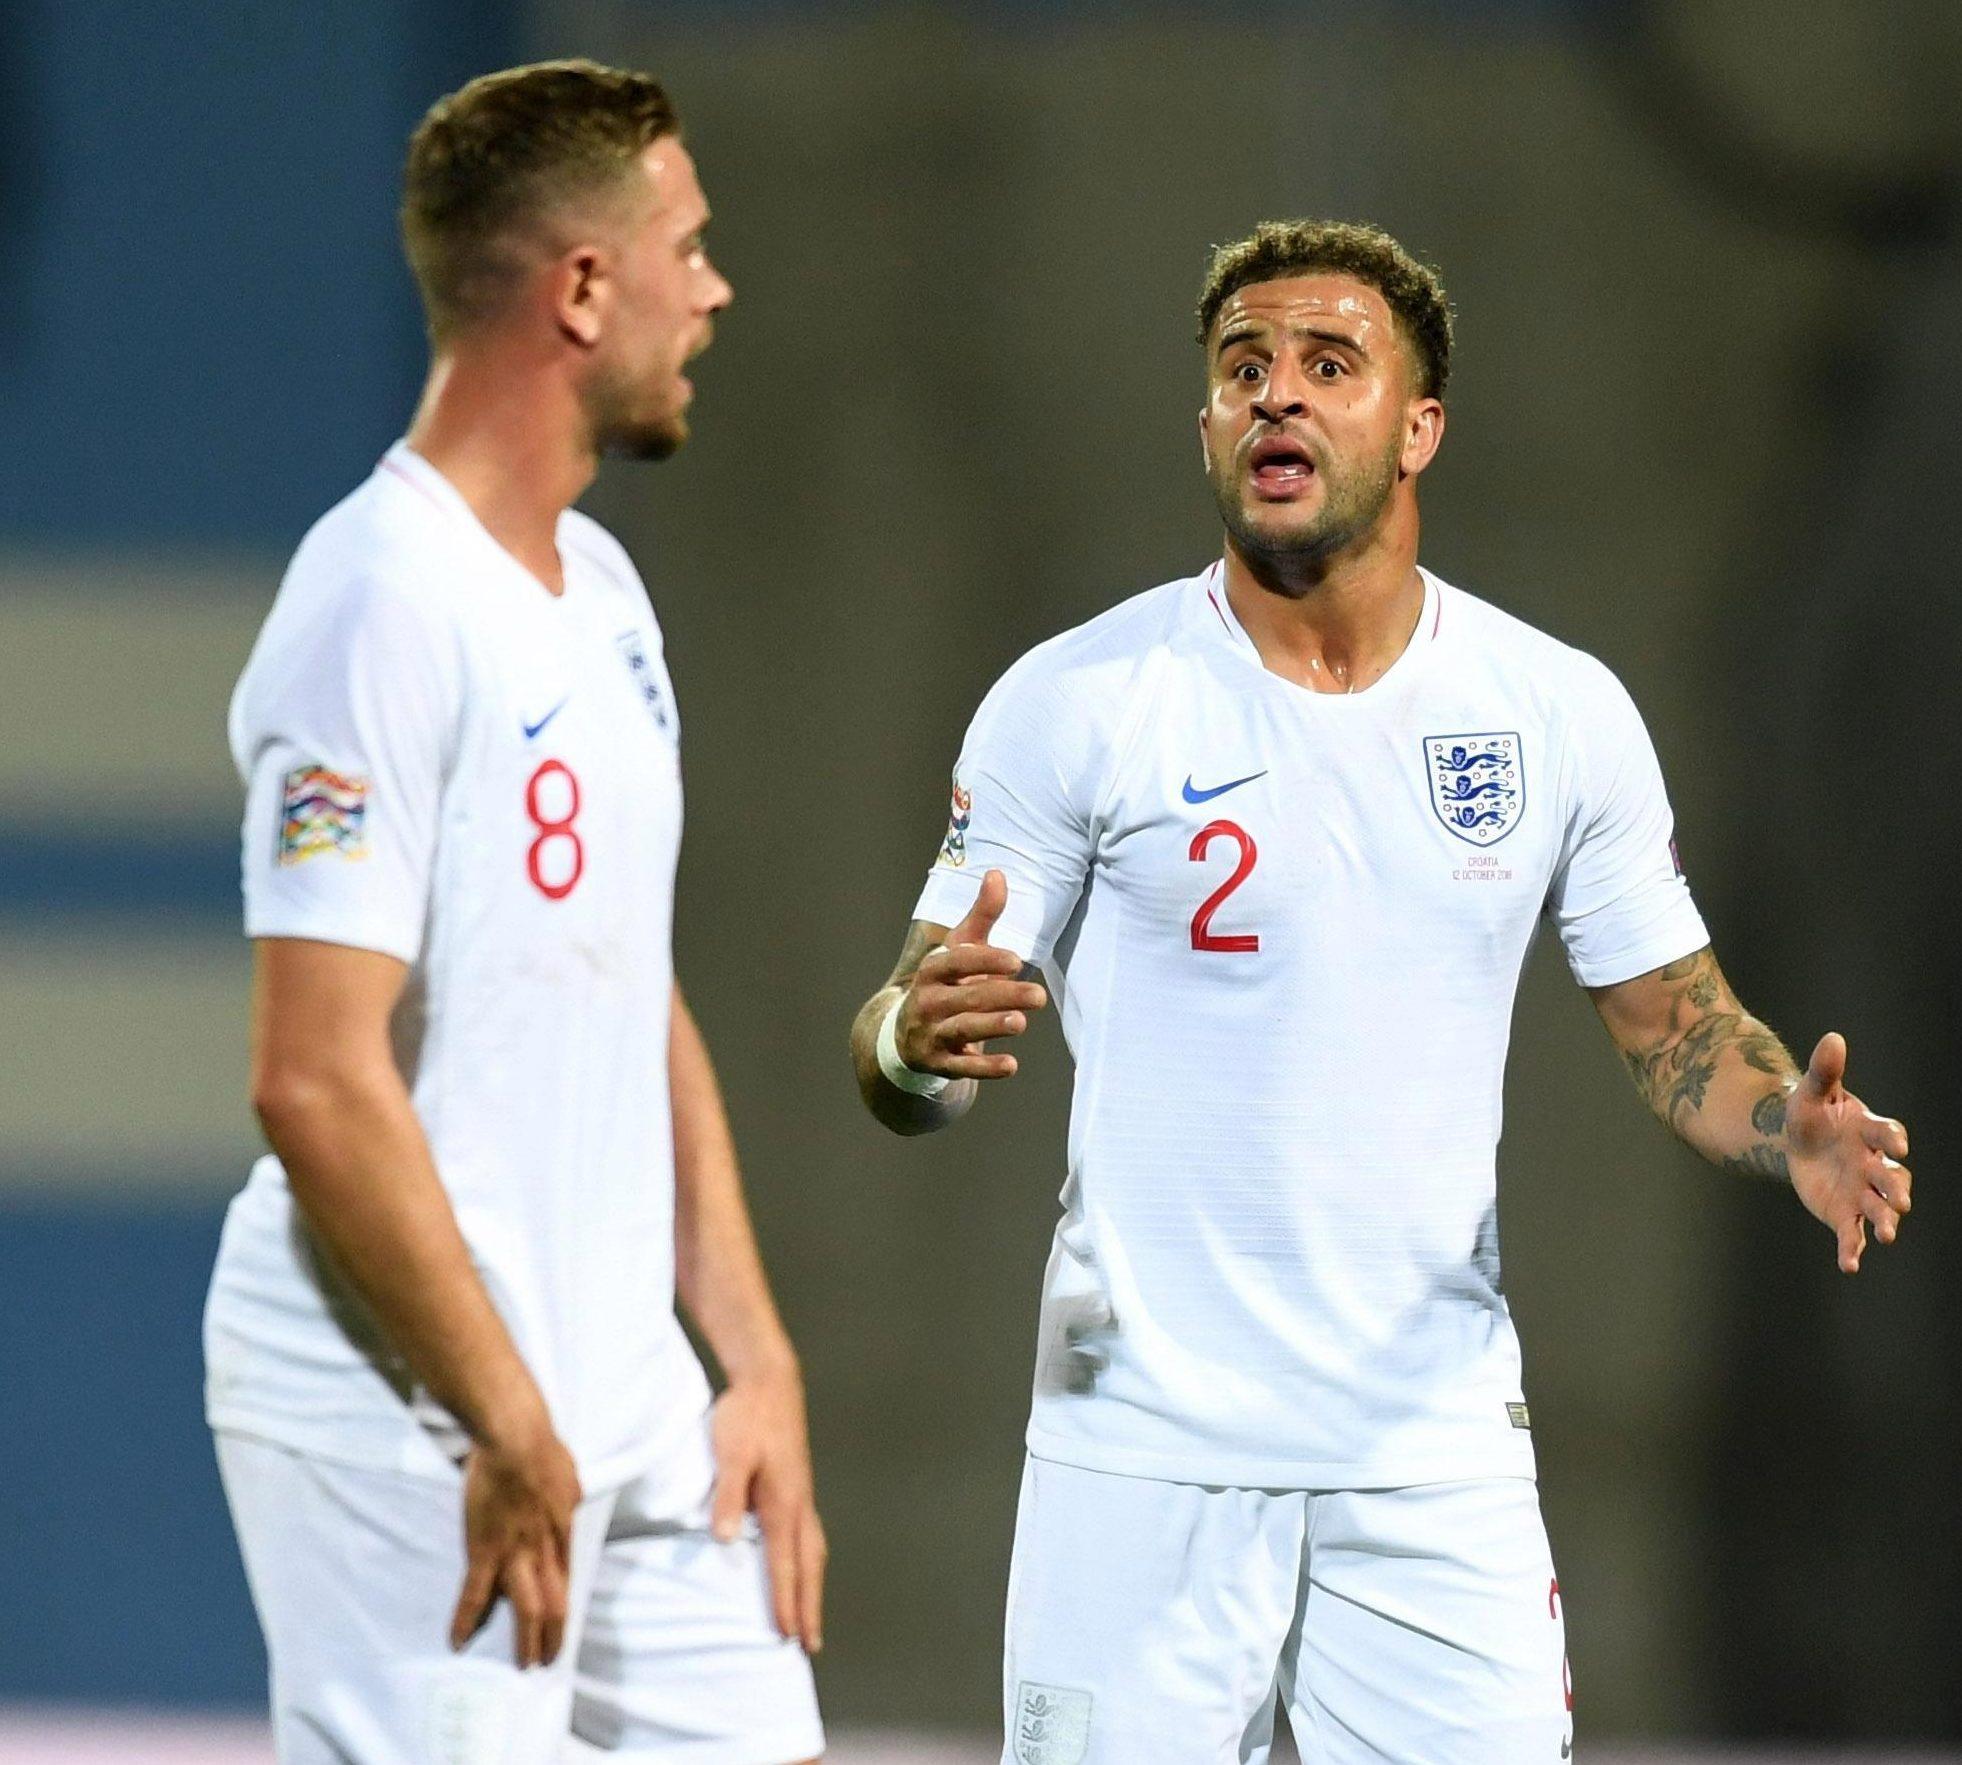 England's Jordan Henderson (left) with Kyle Walker was seen addressing the referee politely